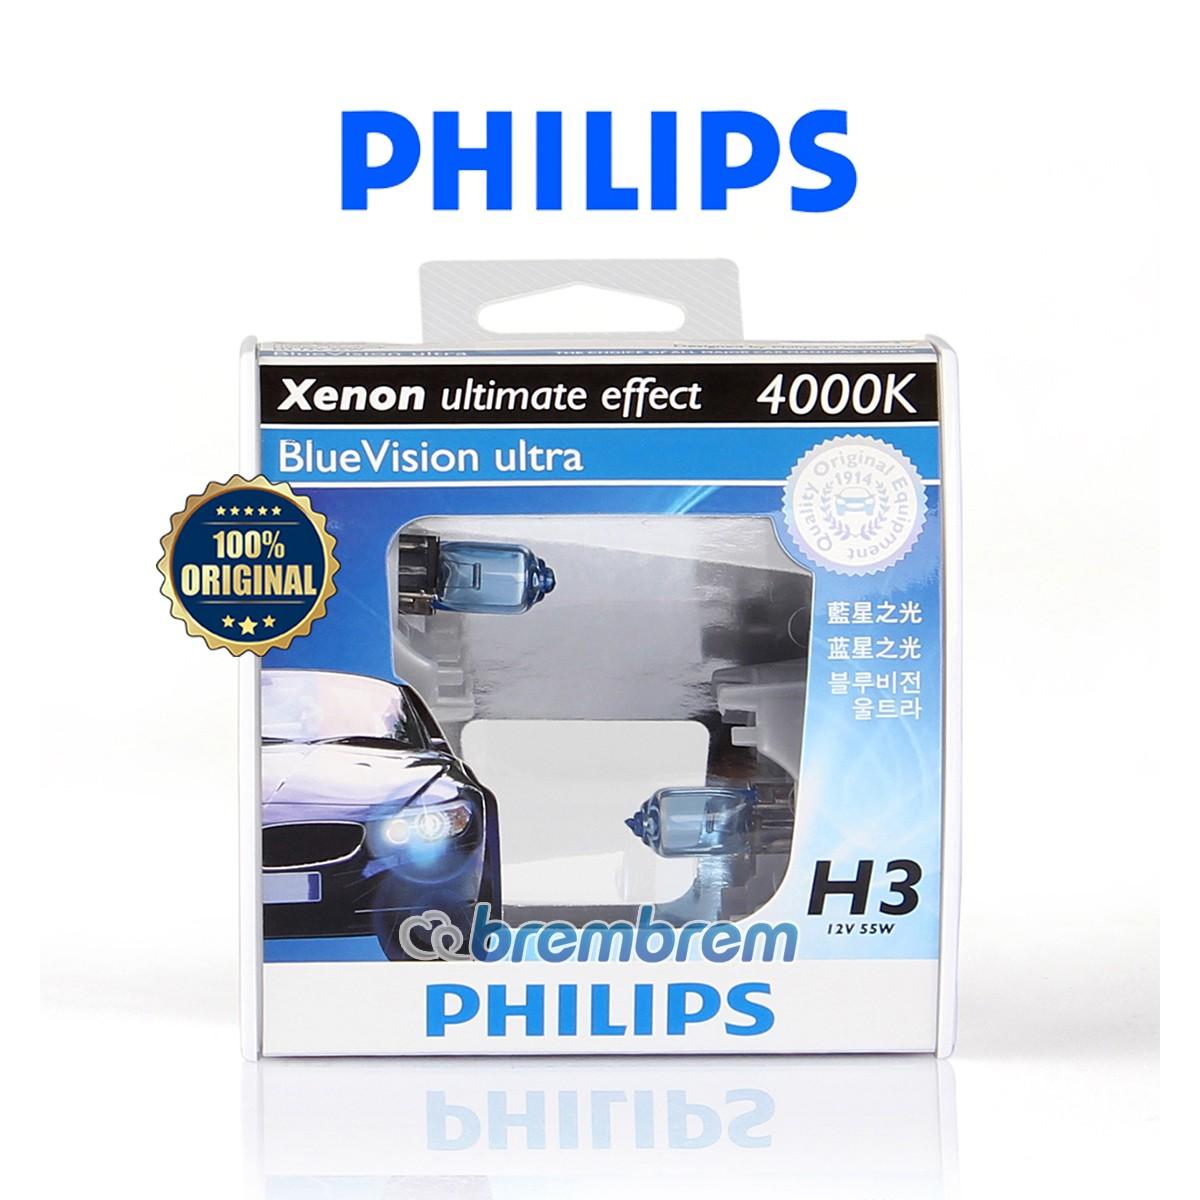 PHILIPS BLUE VISION ULTRA H3 (4000K) - LAMPU HALOGEN